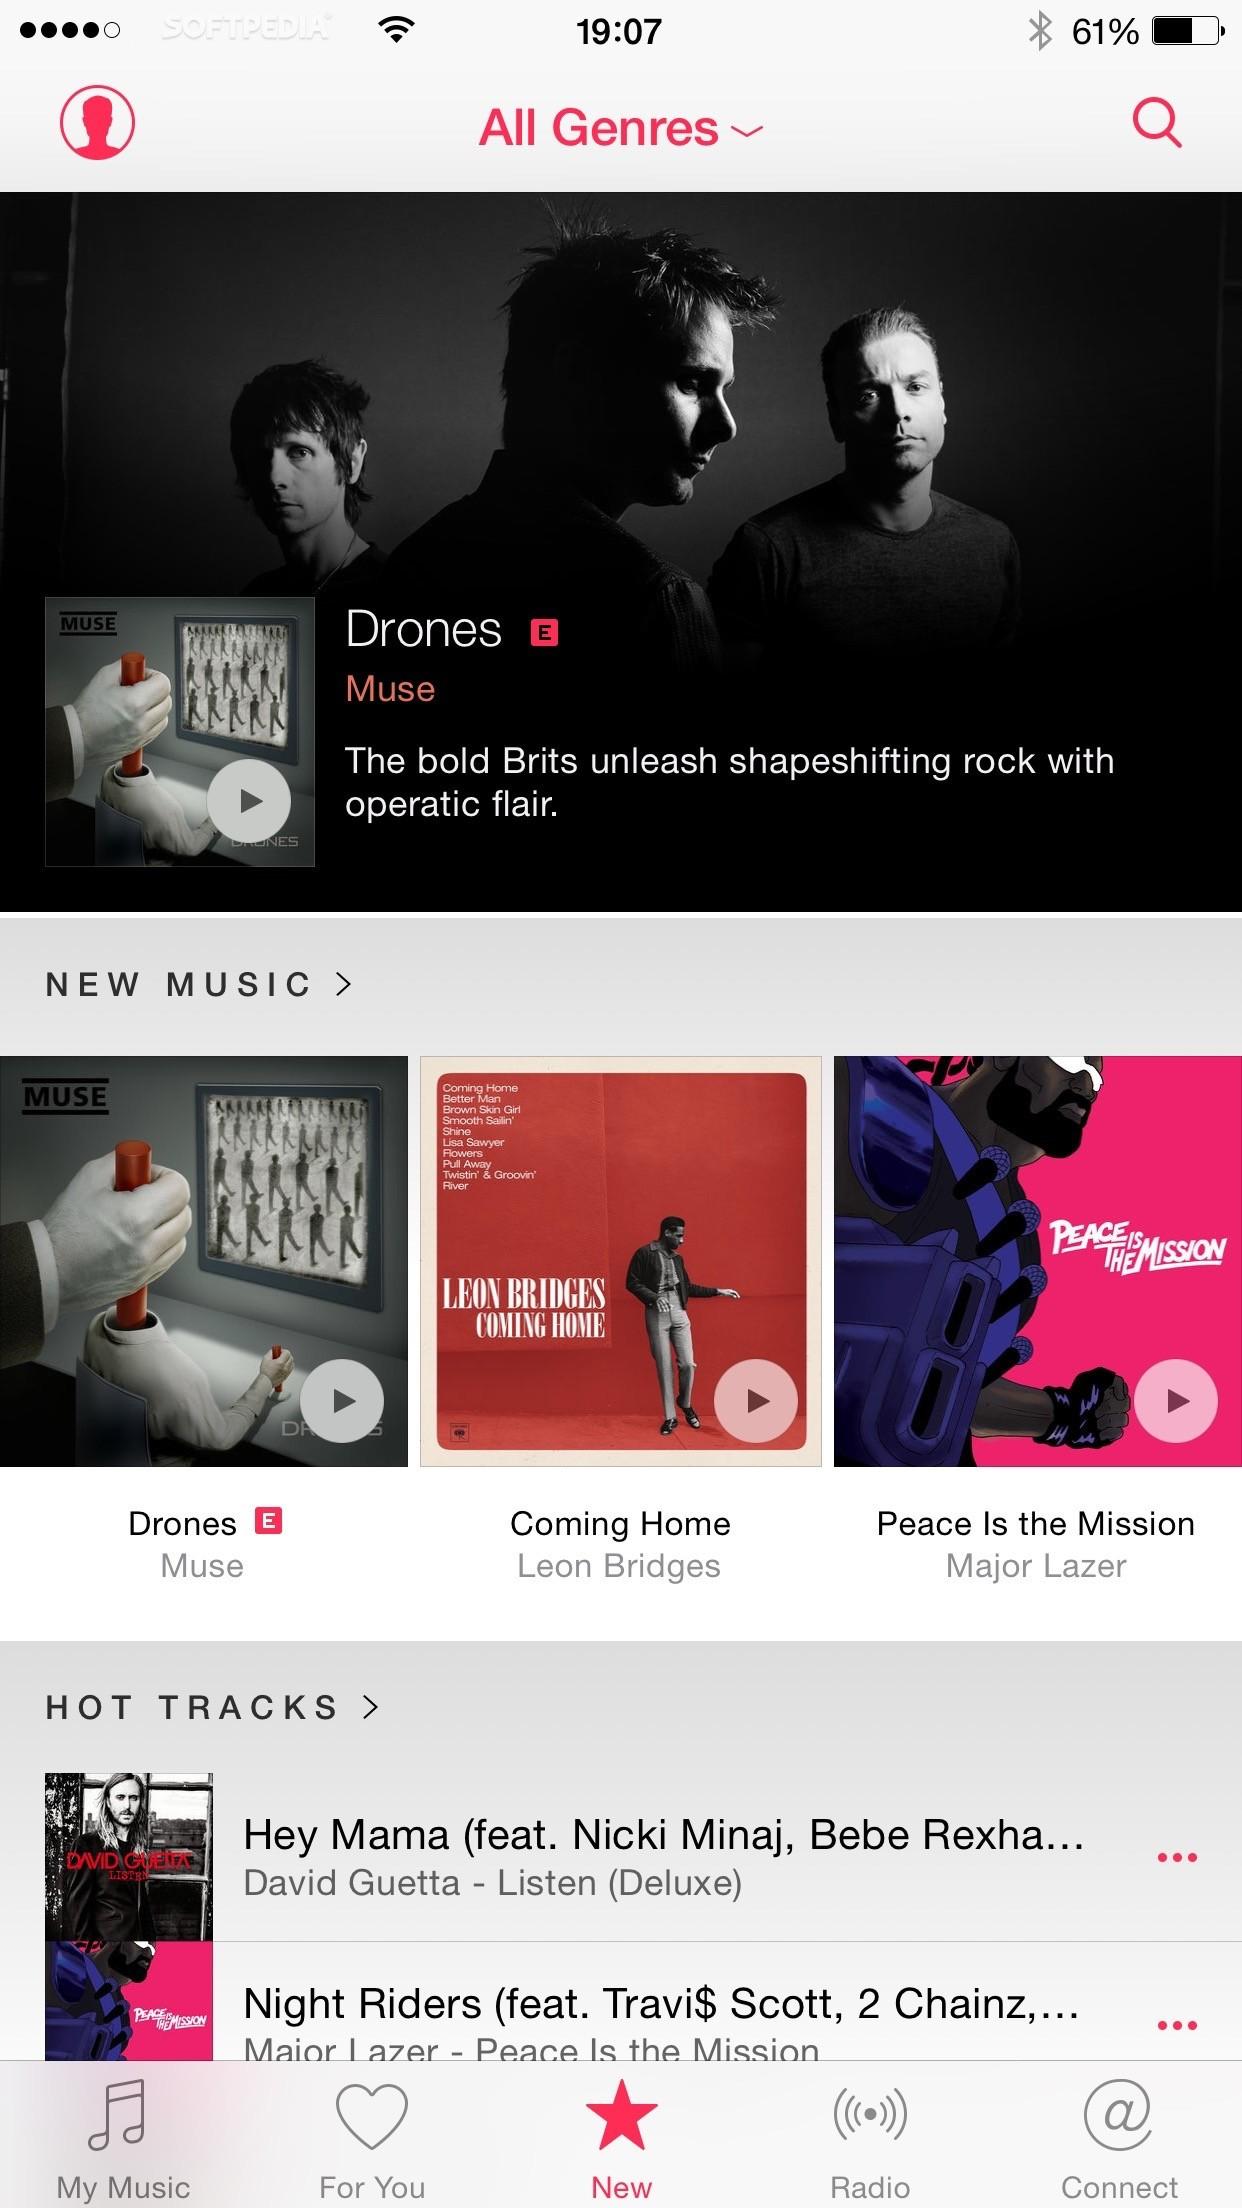 Ios 8.4: Apple Music, Audiobooks, Wi-Fi Bug Fix and a Jailbreak